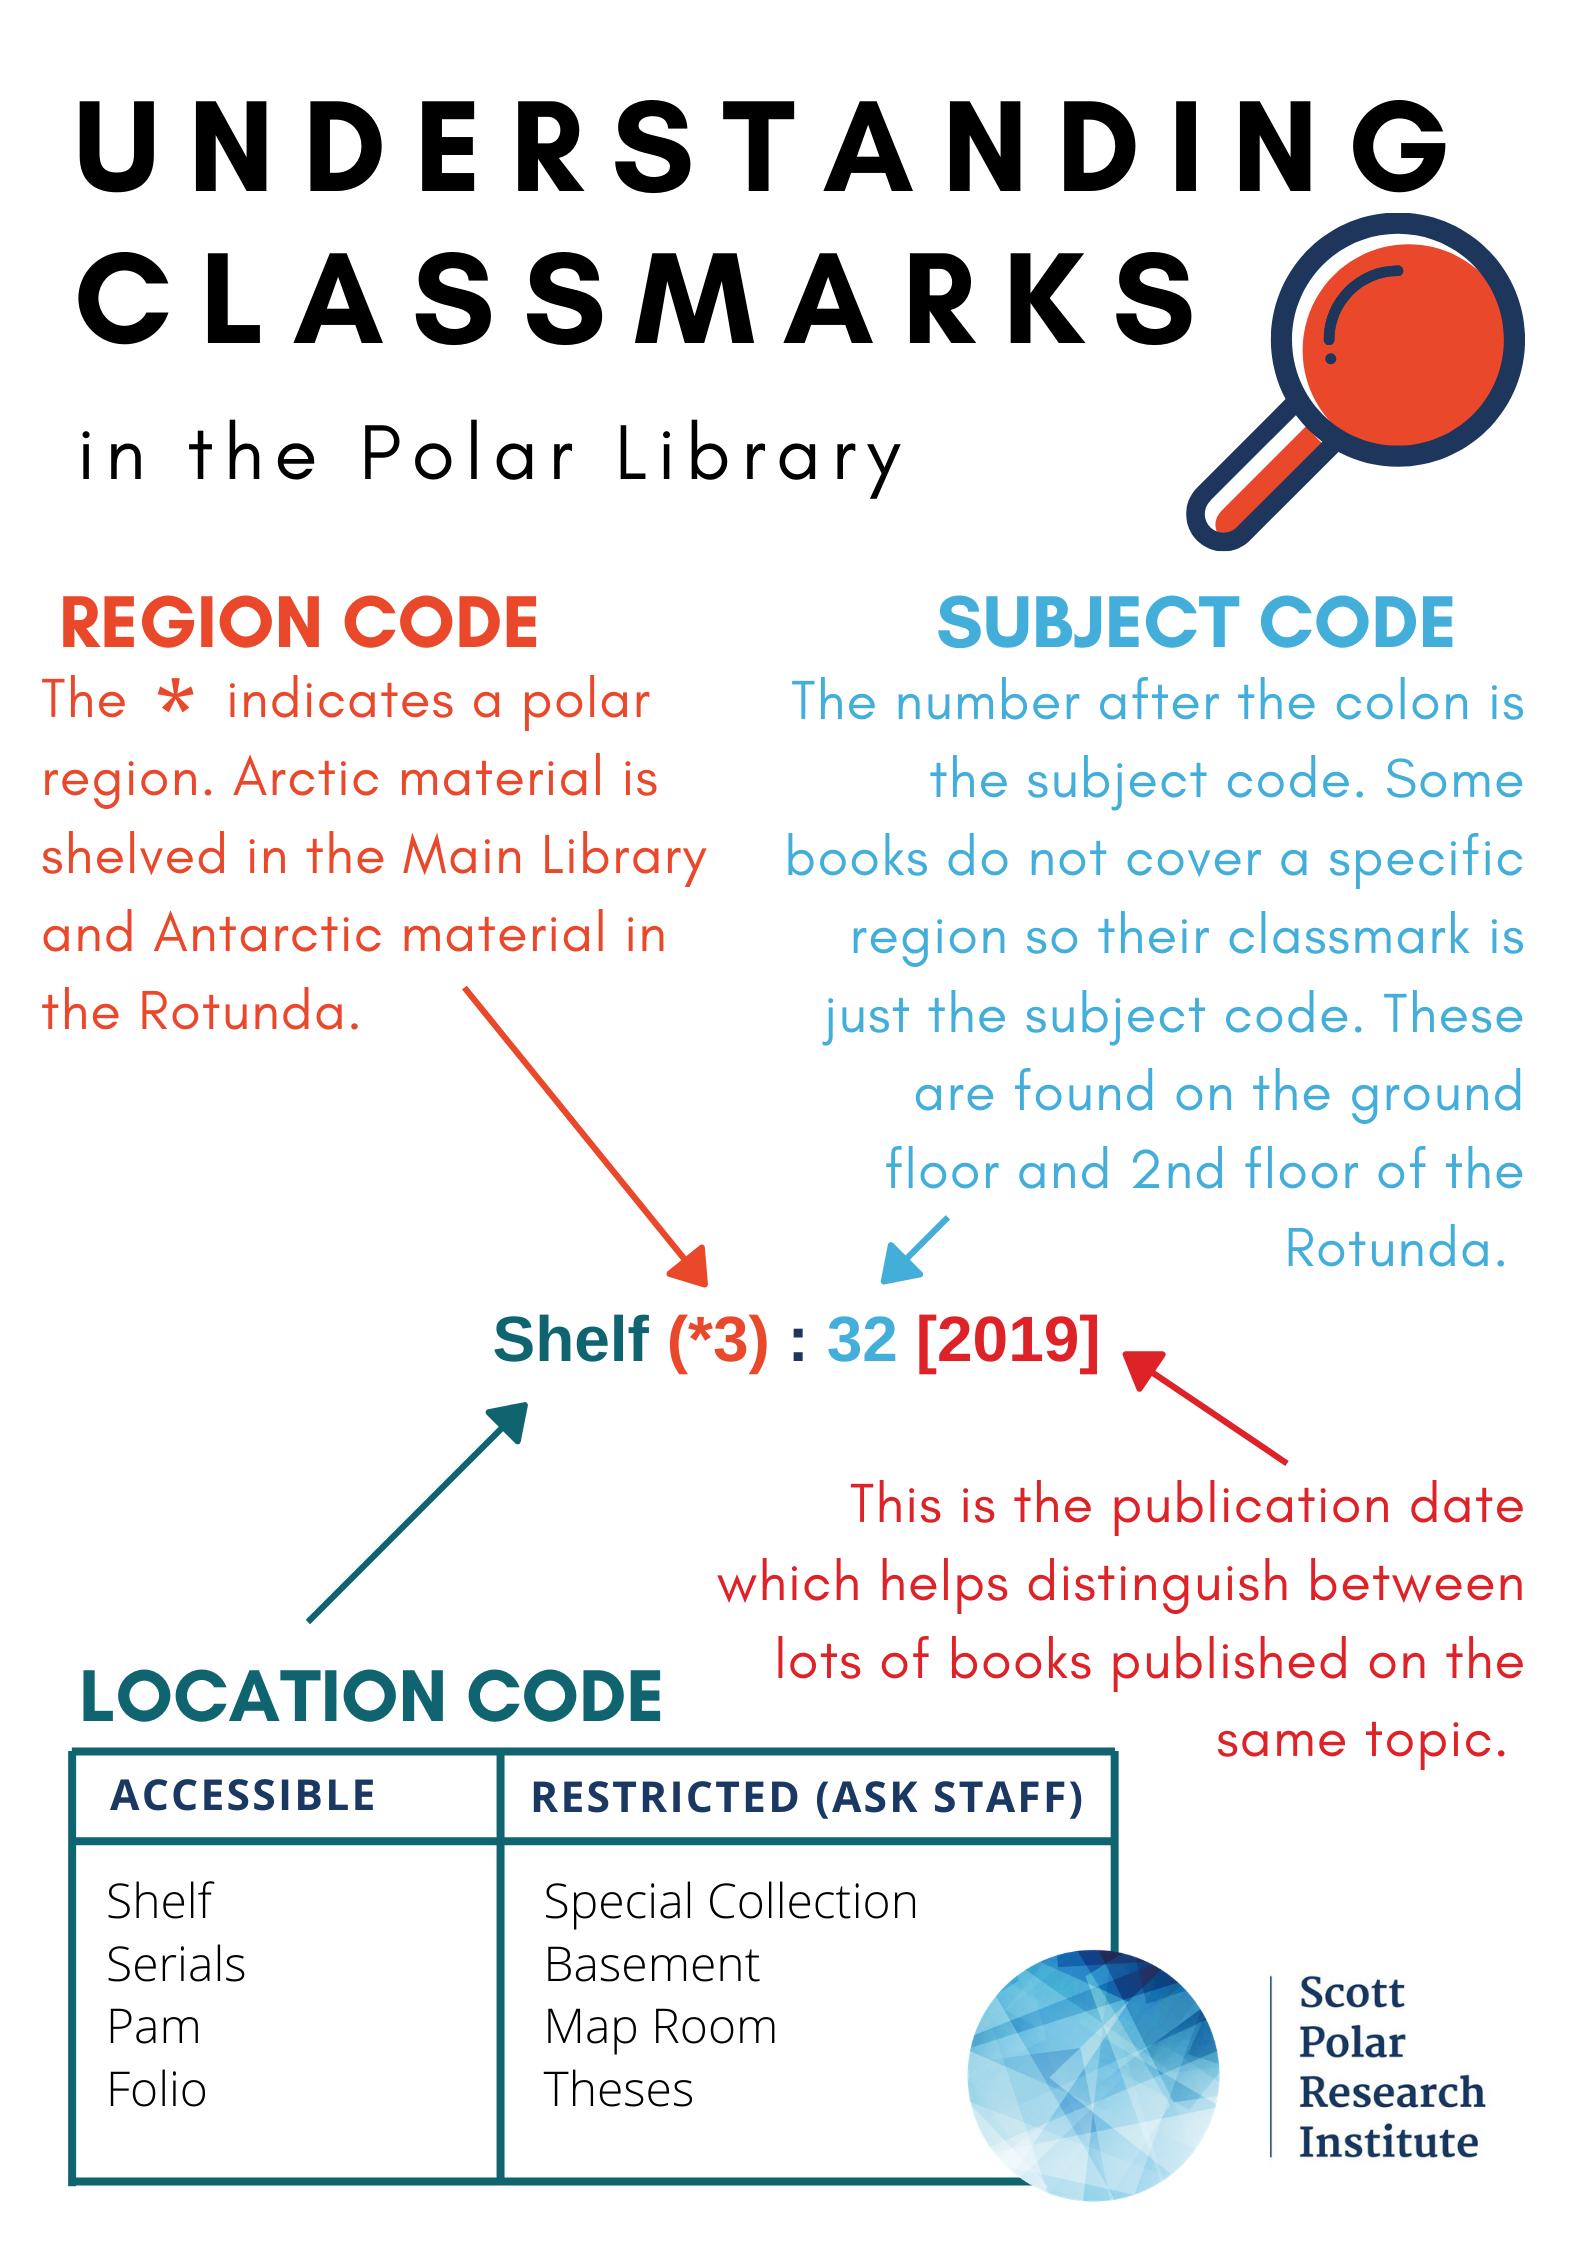 Poster on understanding Polar Library classmarks